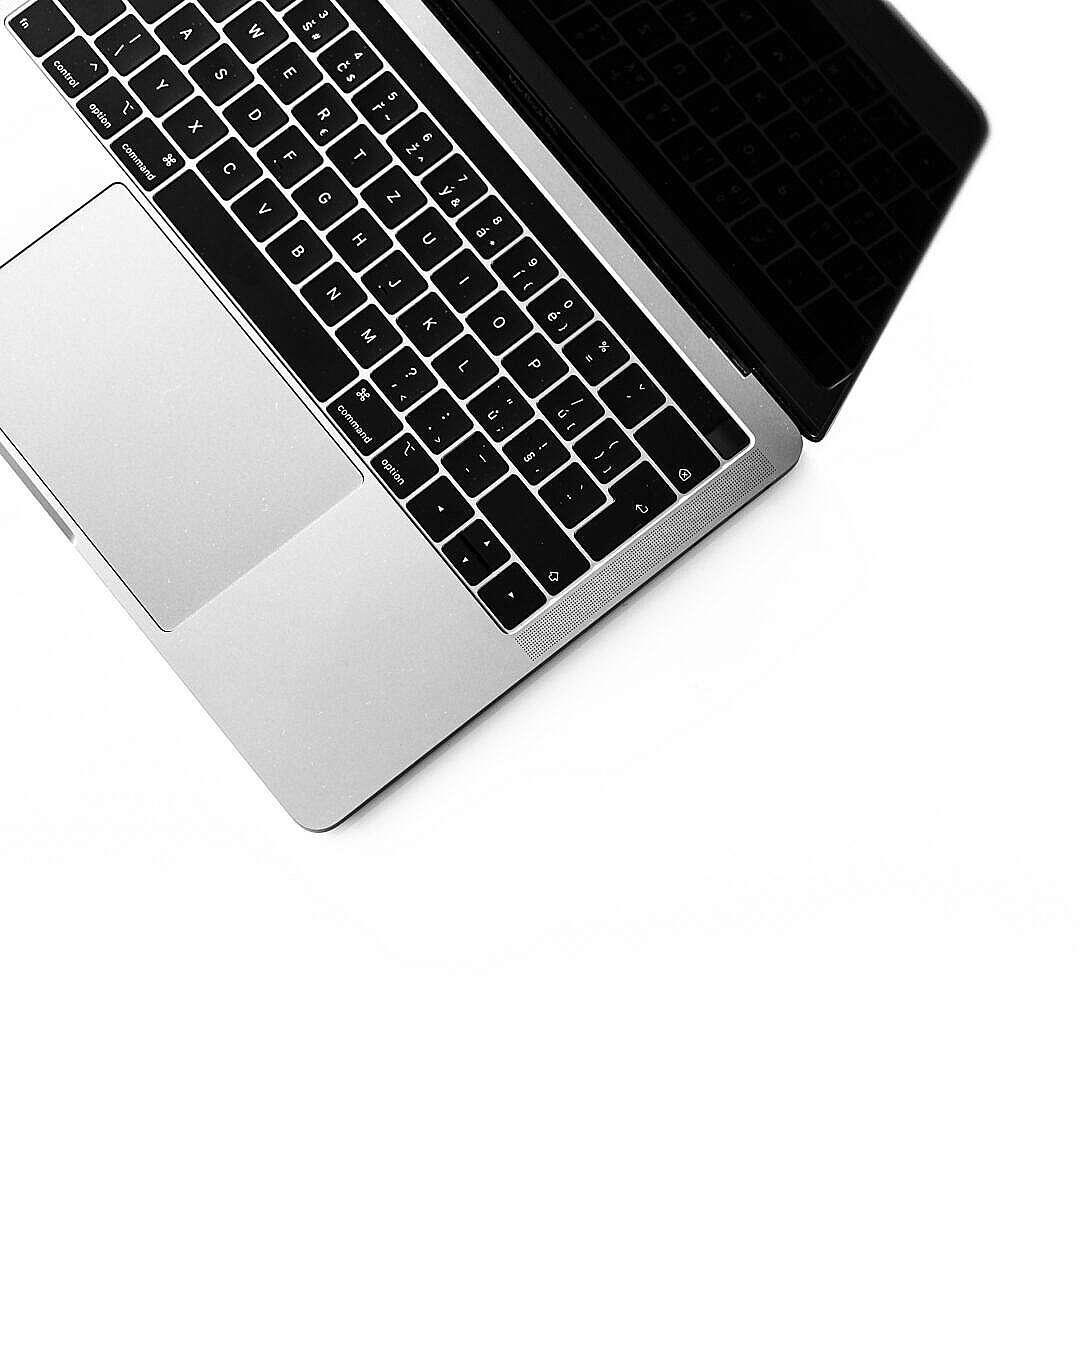 Download Minimalistic Laptop Keyboard Isolated FREE Stock Photo